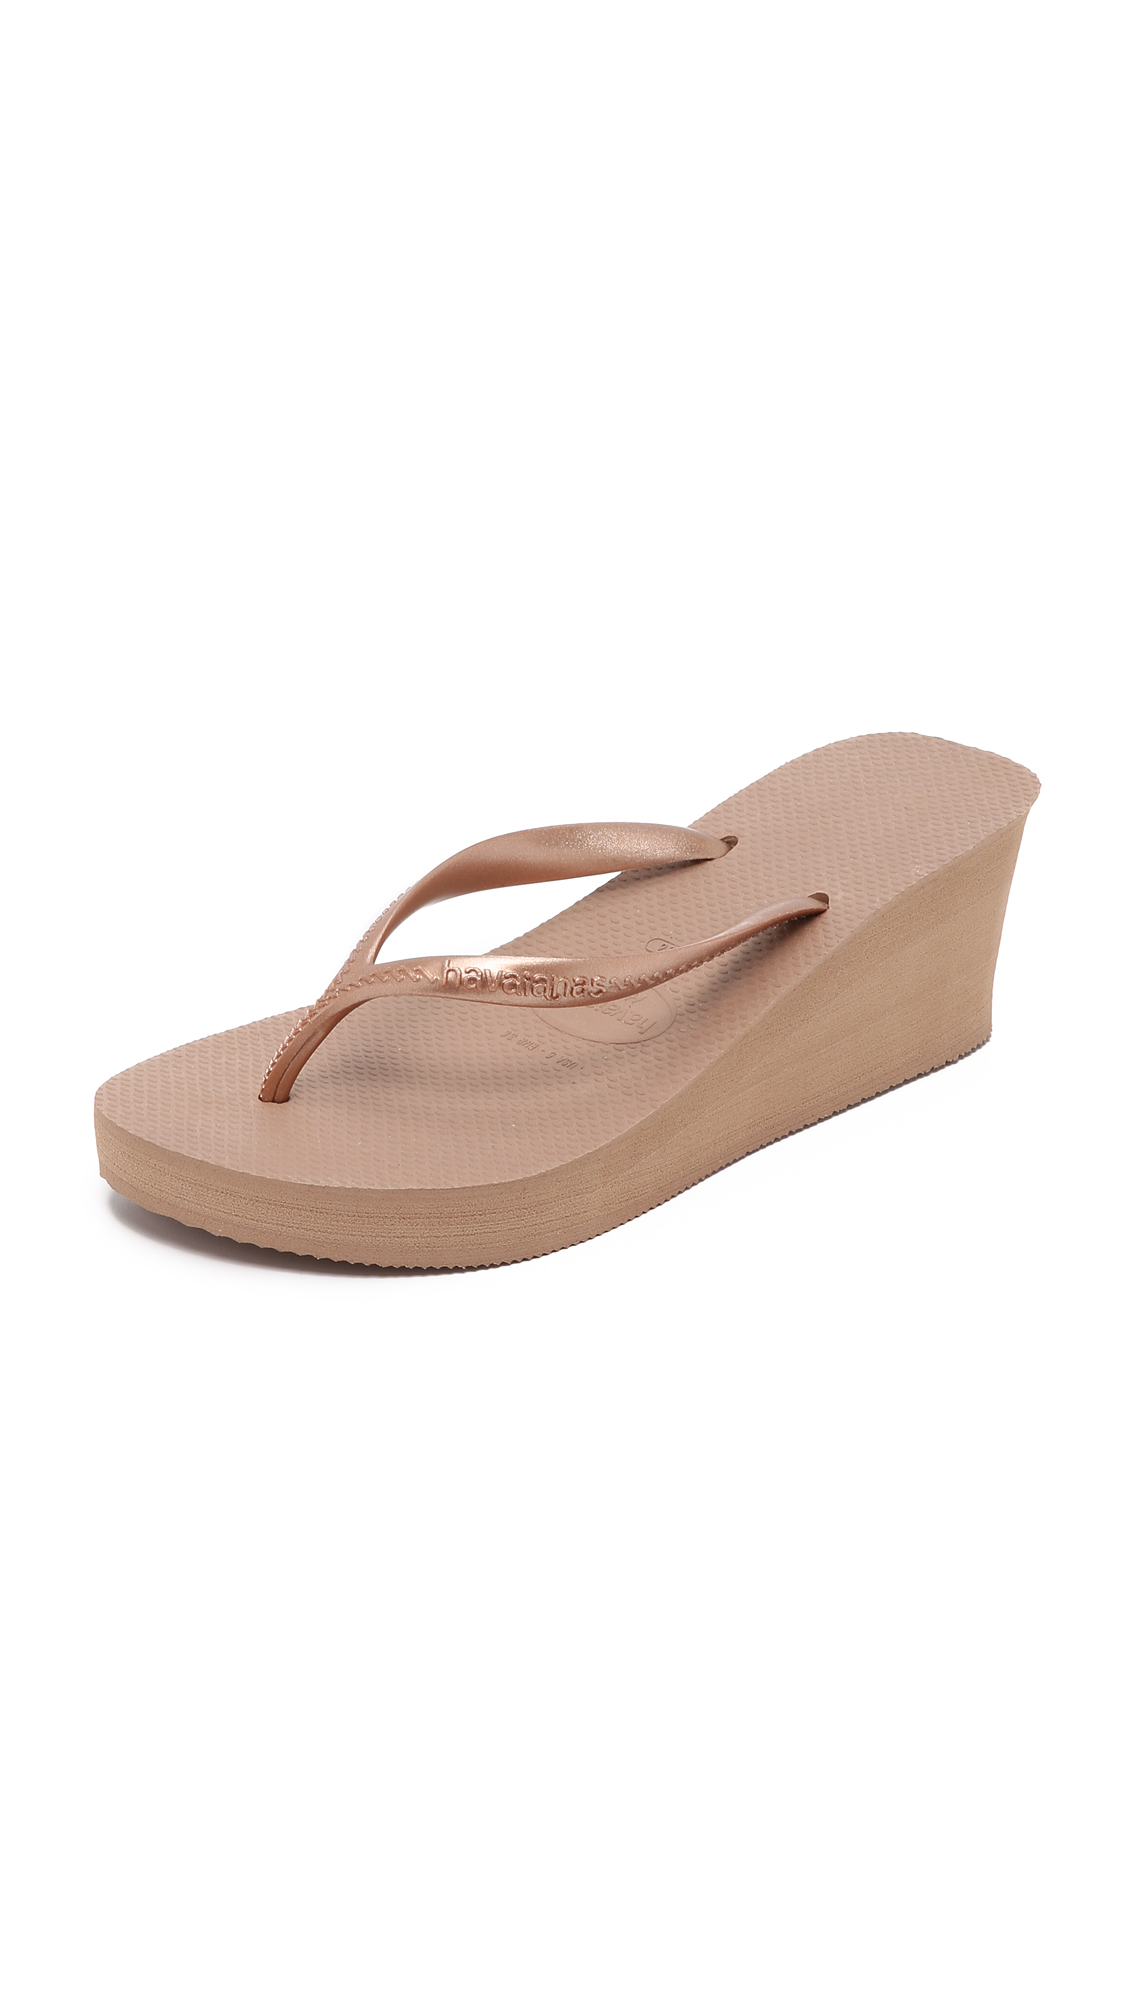 Havaianas High Fashion Wedge Flip Flops - Rose Gold at Shopbop